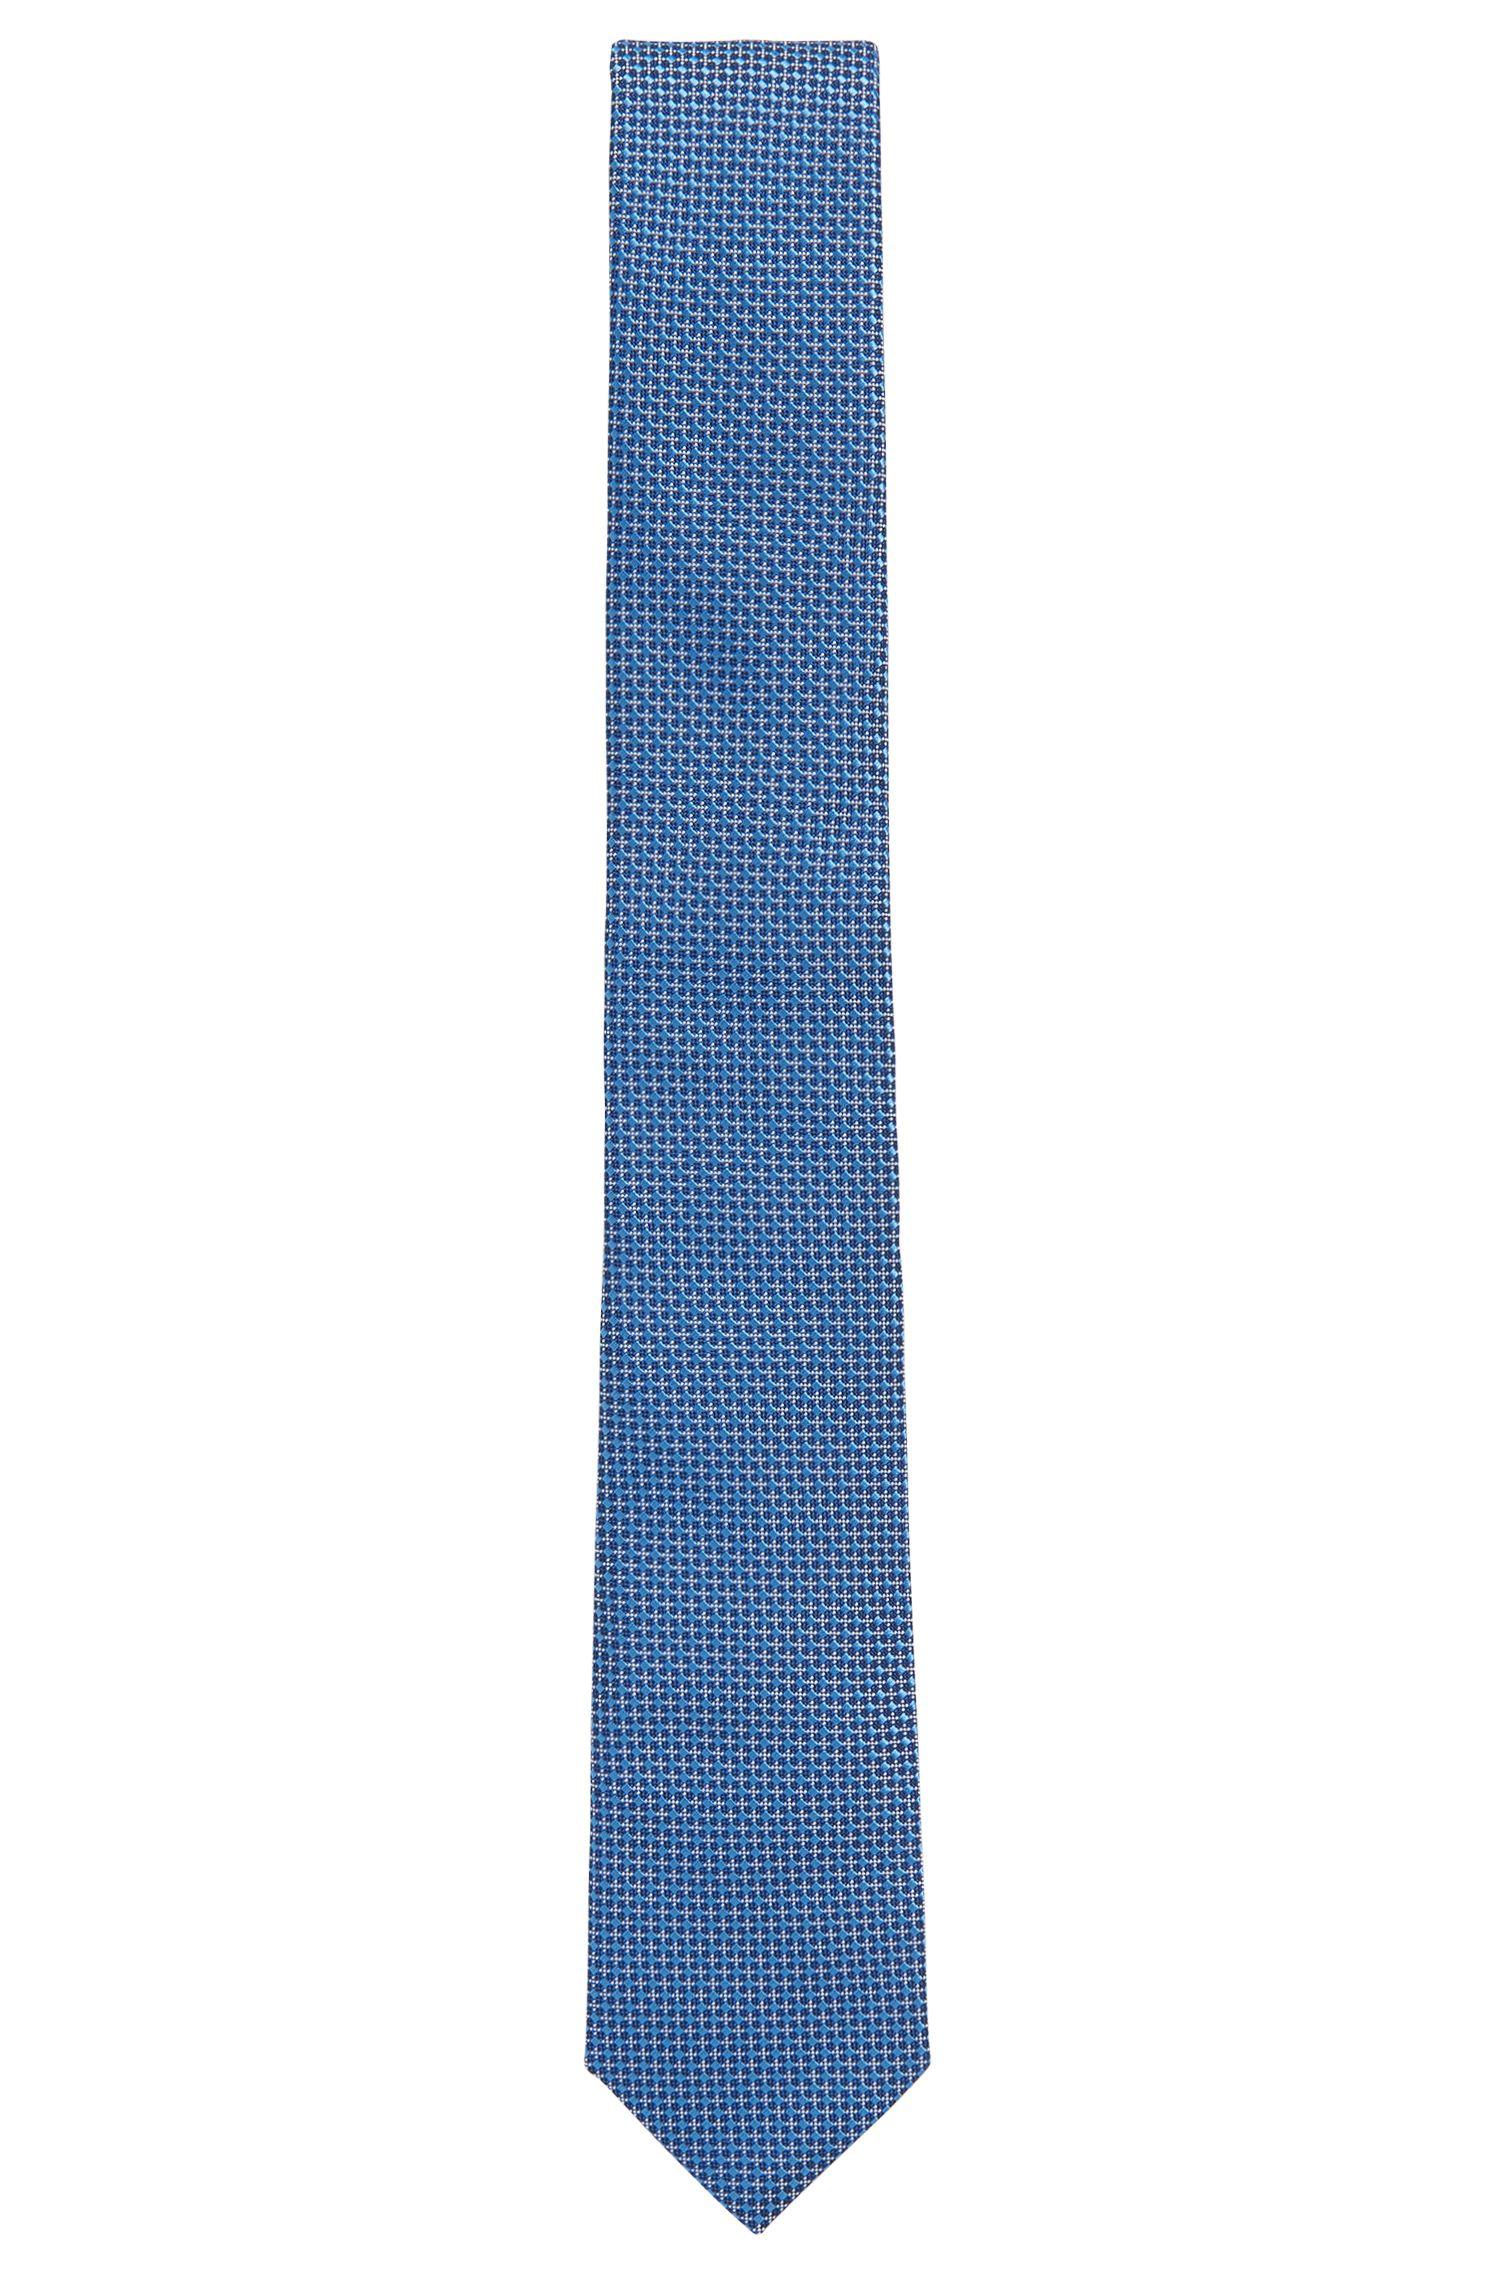 Handmade Italian-silk tie in a patterned jacquard